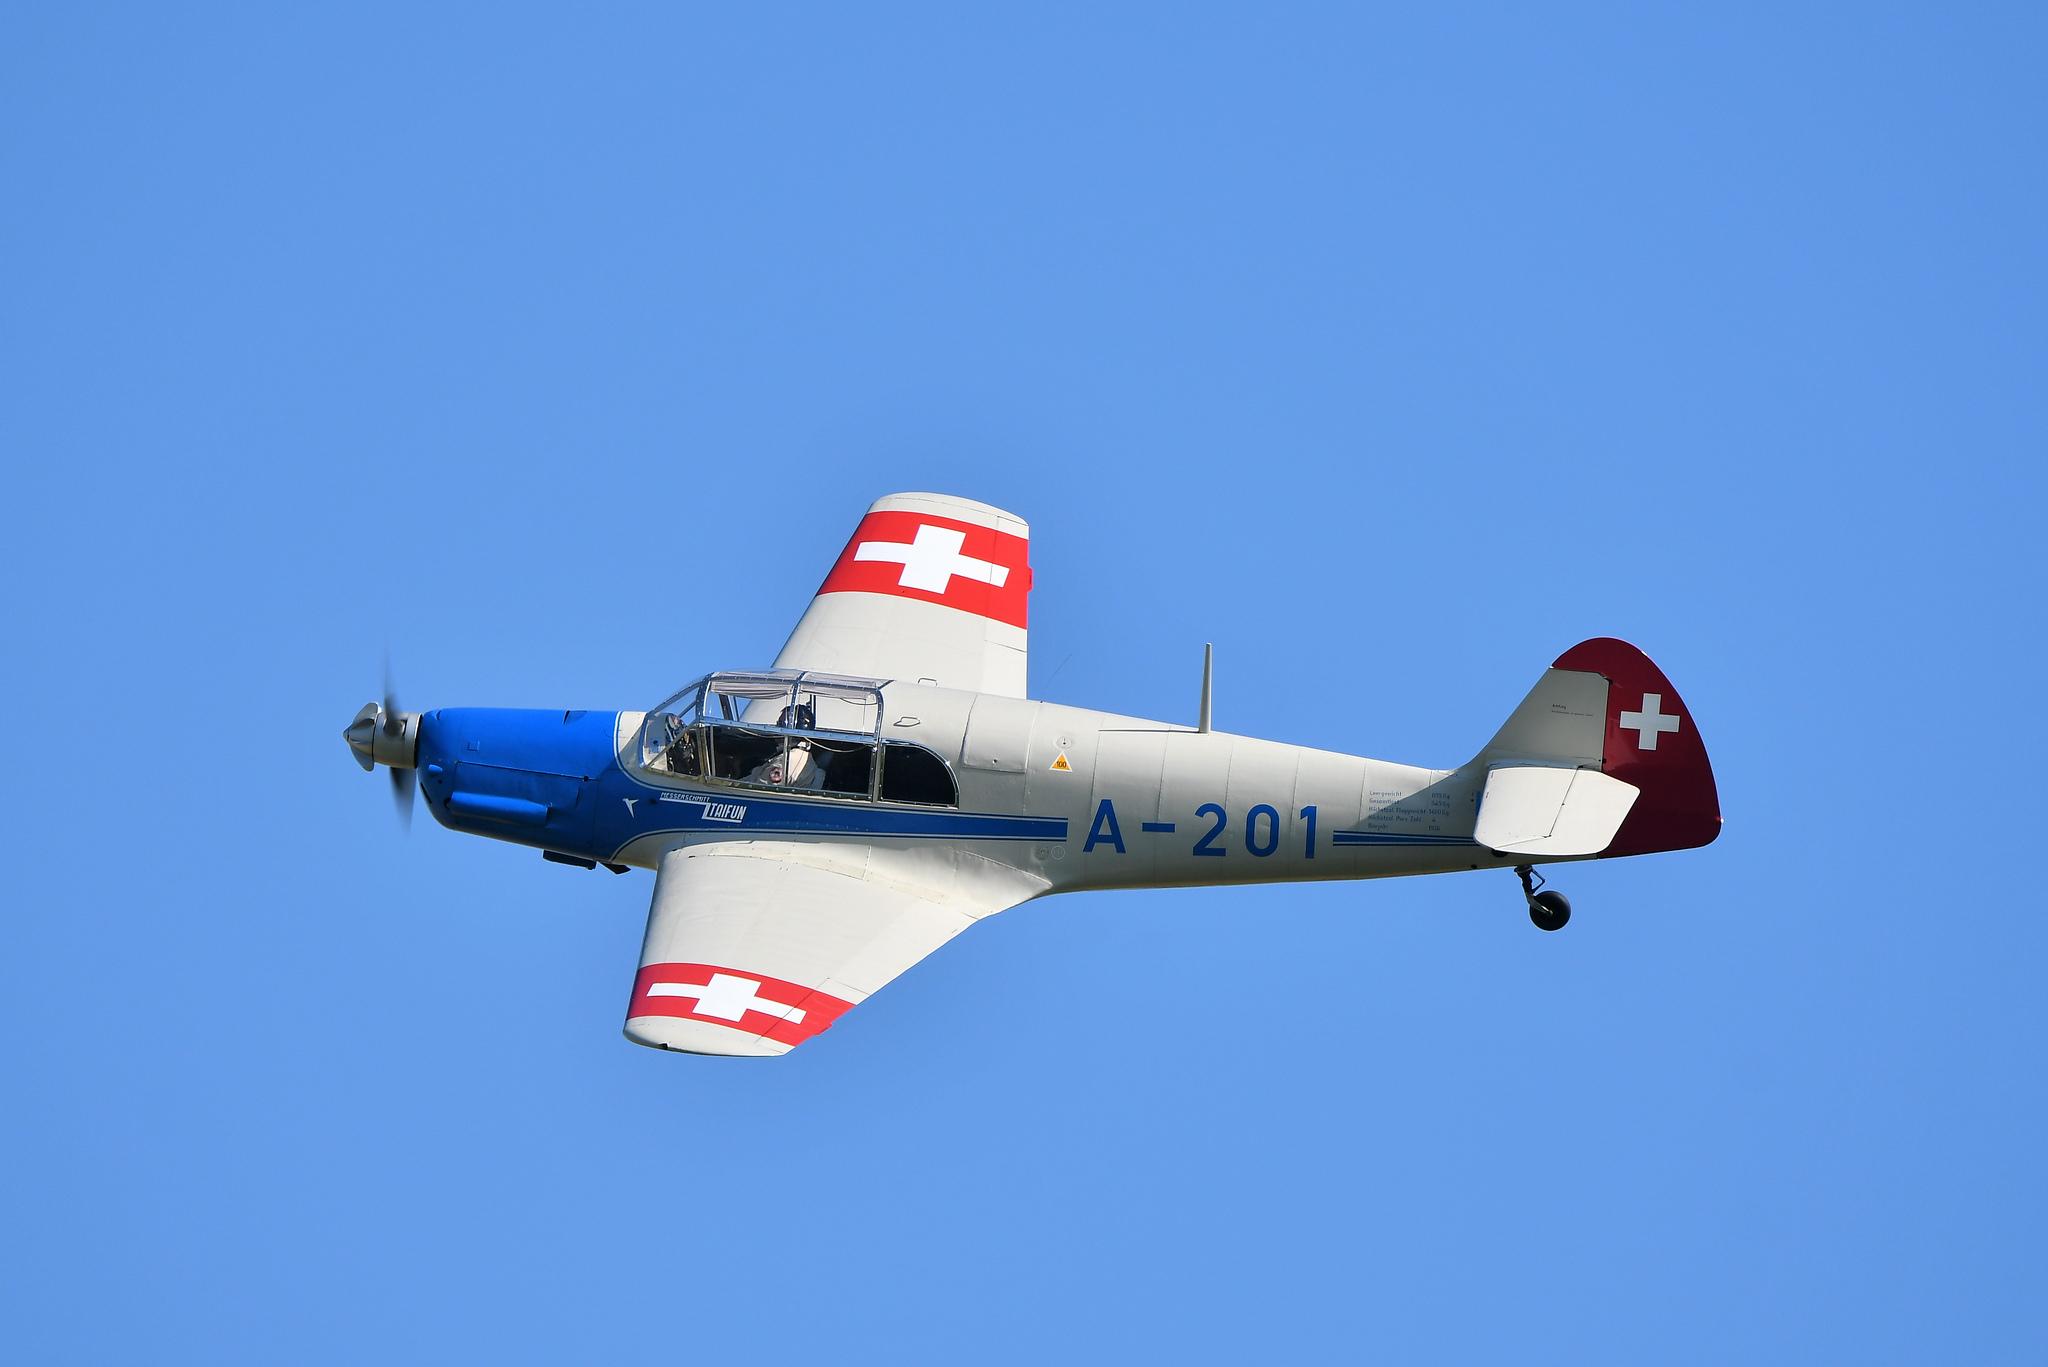 Avioneta BF-108 Taifun - 2048x1367